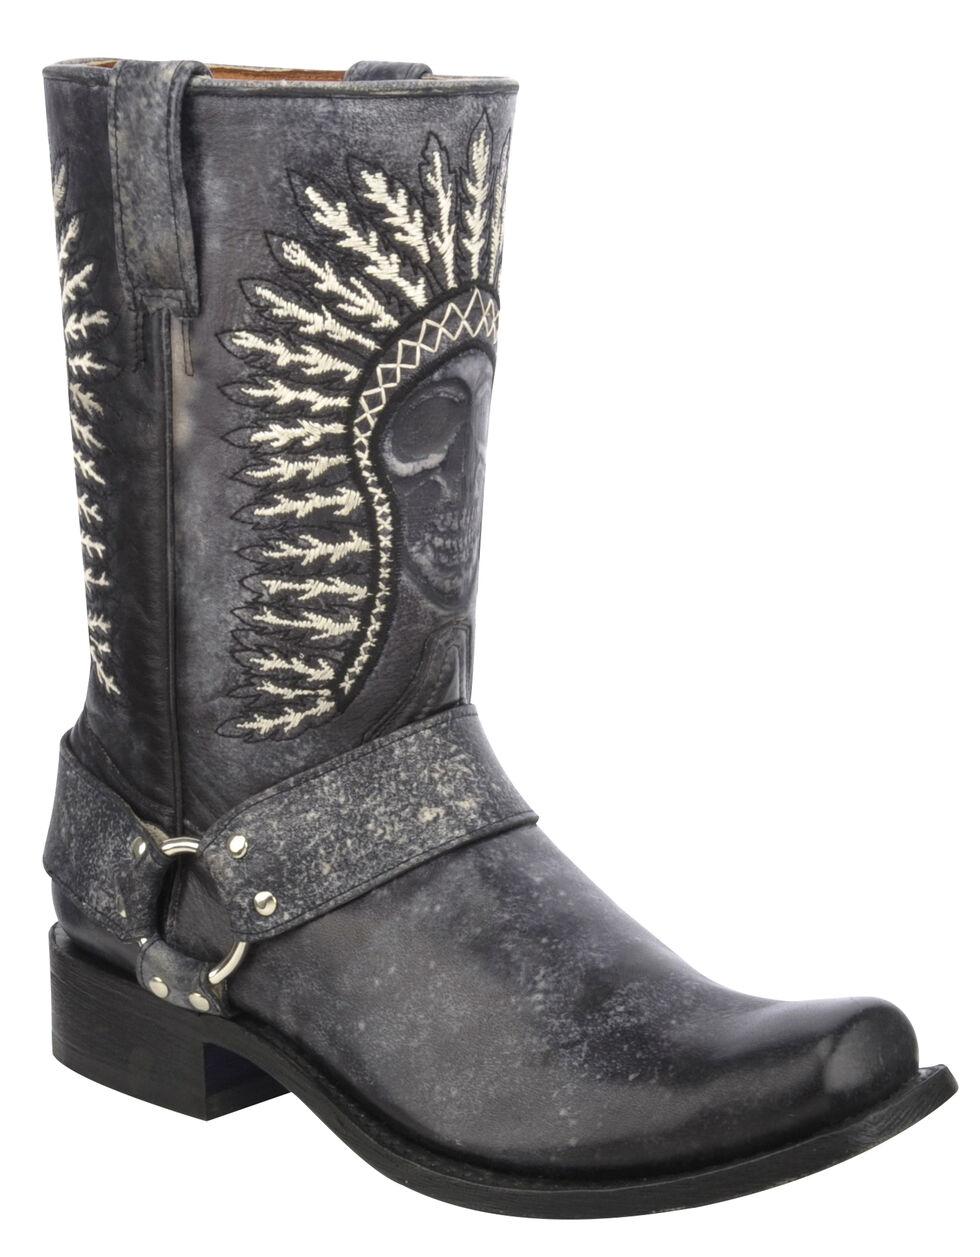 Corral Shaded Skull Harness Cowboy Boots - Square Toe, Black, hi-res